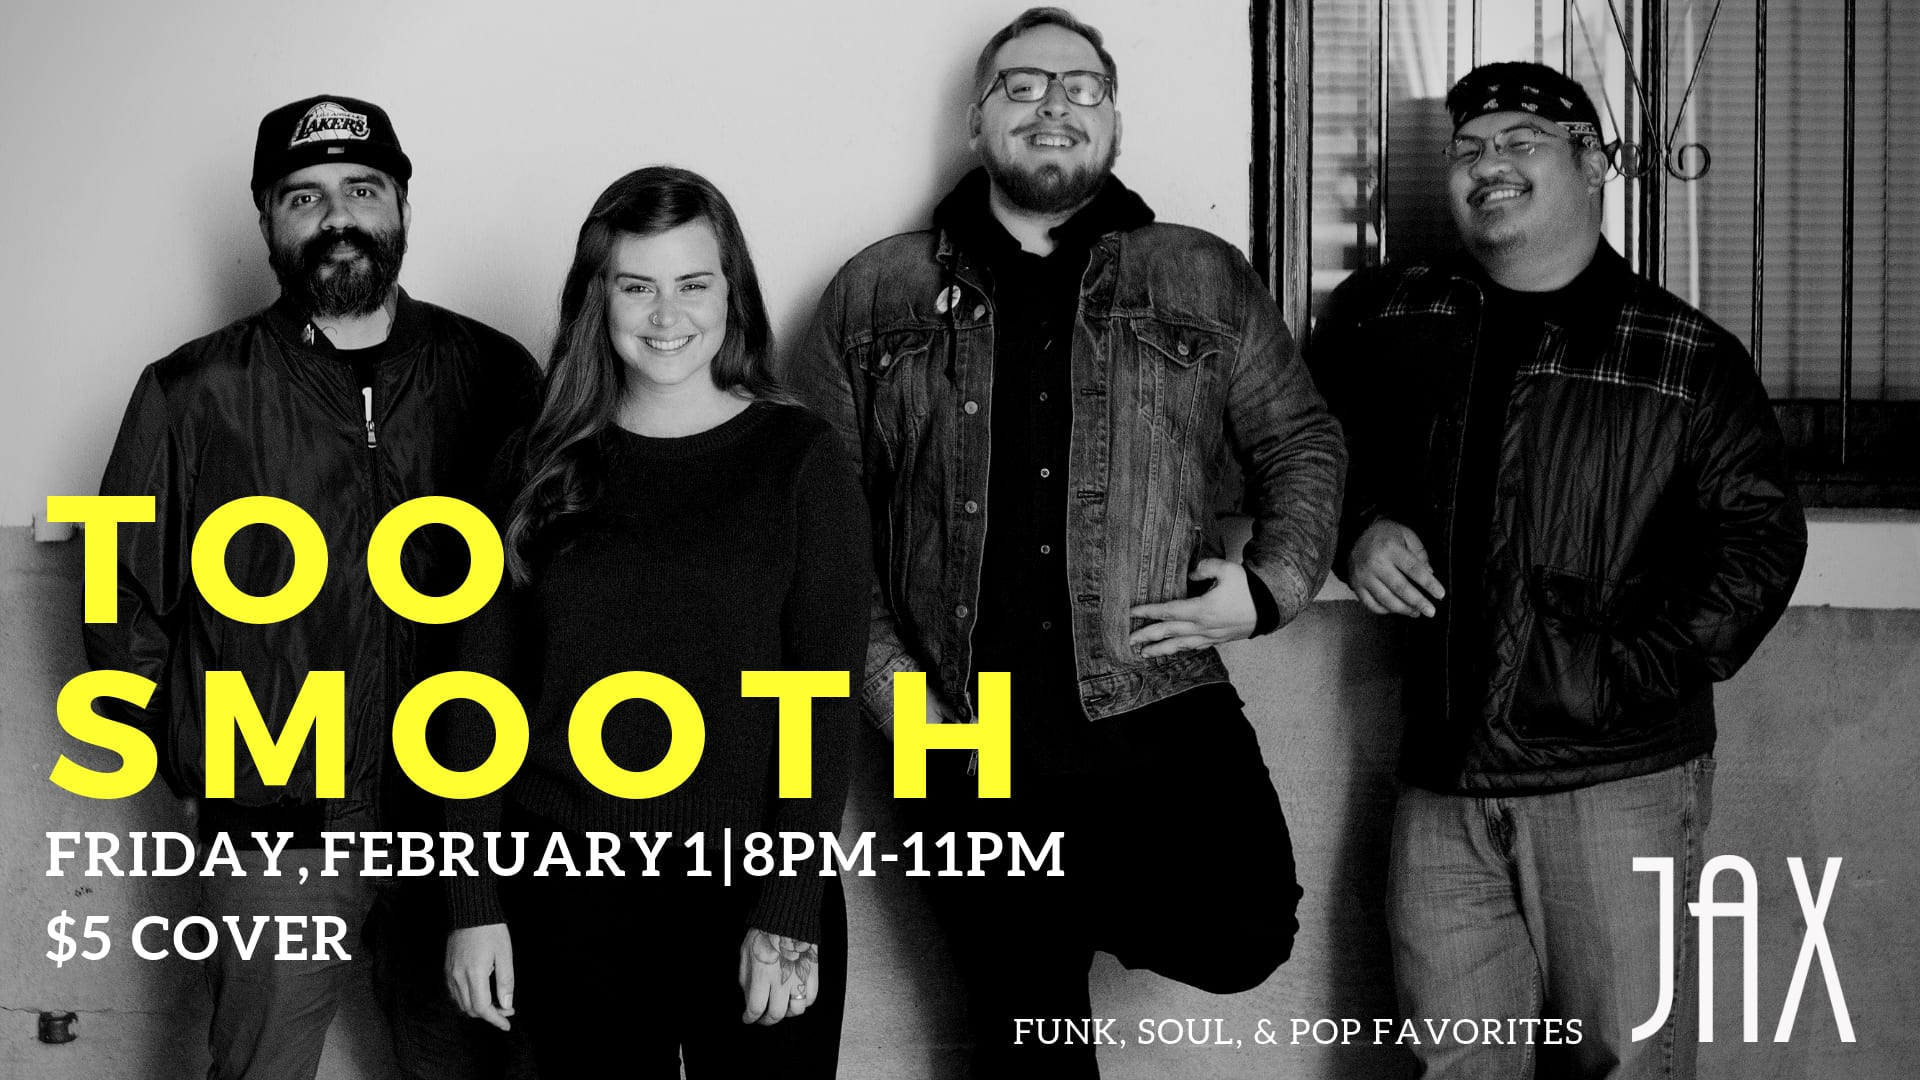 February 1 | TOO SMOOTH